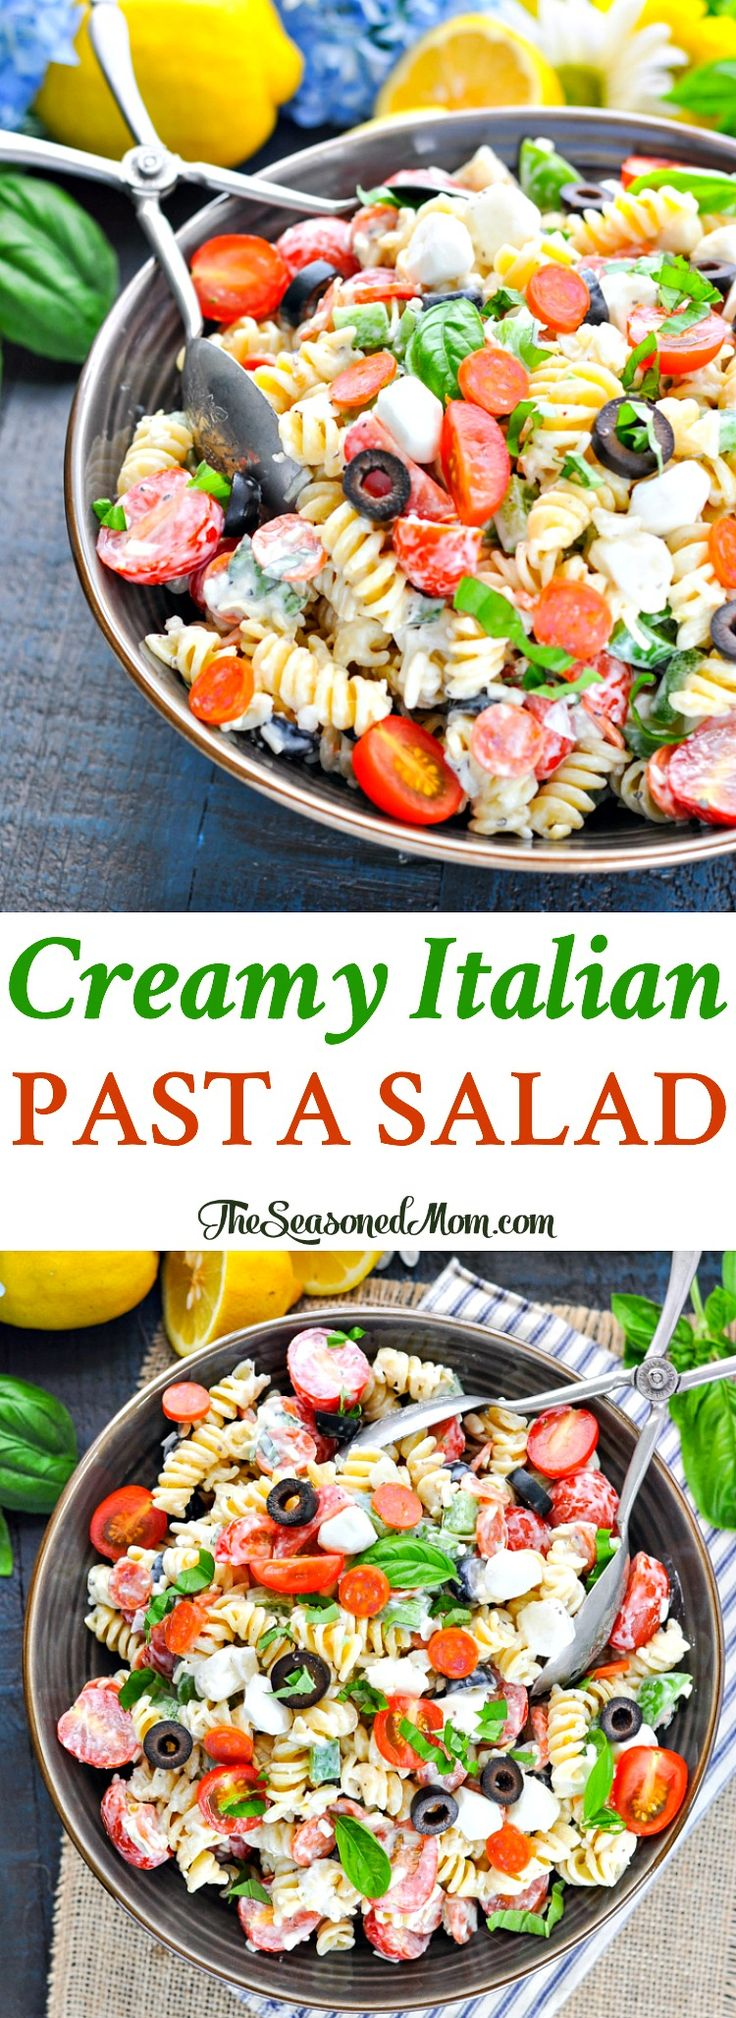 Creamy Italian Pasta Salad | Pasta Salad Recipes | Pasta Recipes | Pasta Salad with Italian Dressing | Easy Dinner Recipes | Potluck Recipes | Salad Recipes | Salads for Parties #ad